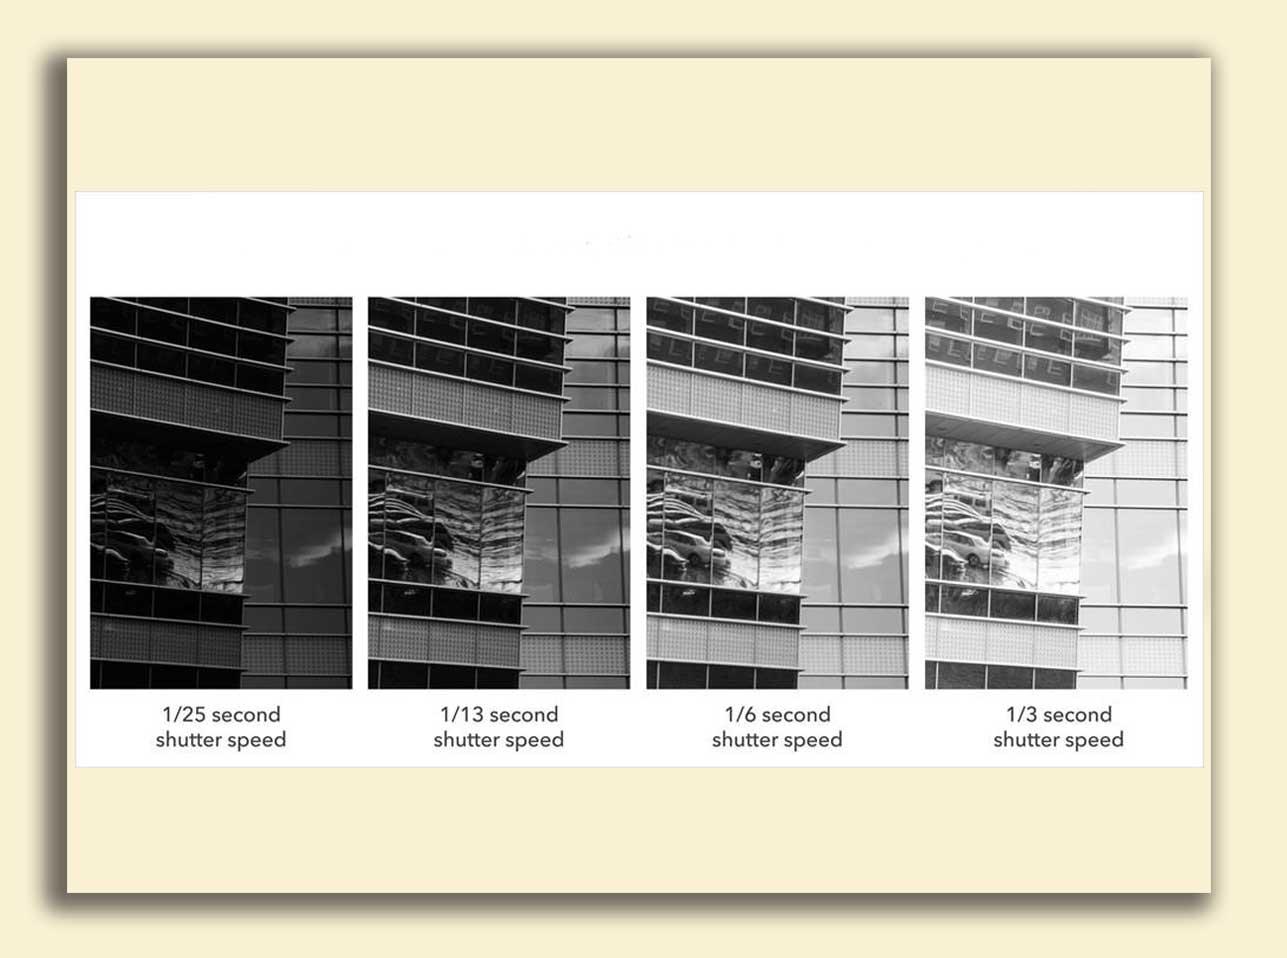 Exposure 8 - نوردهی در عکاسی چیست؟ (راهنمای مبتدیان)